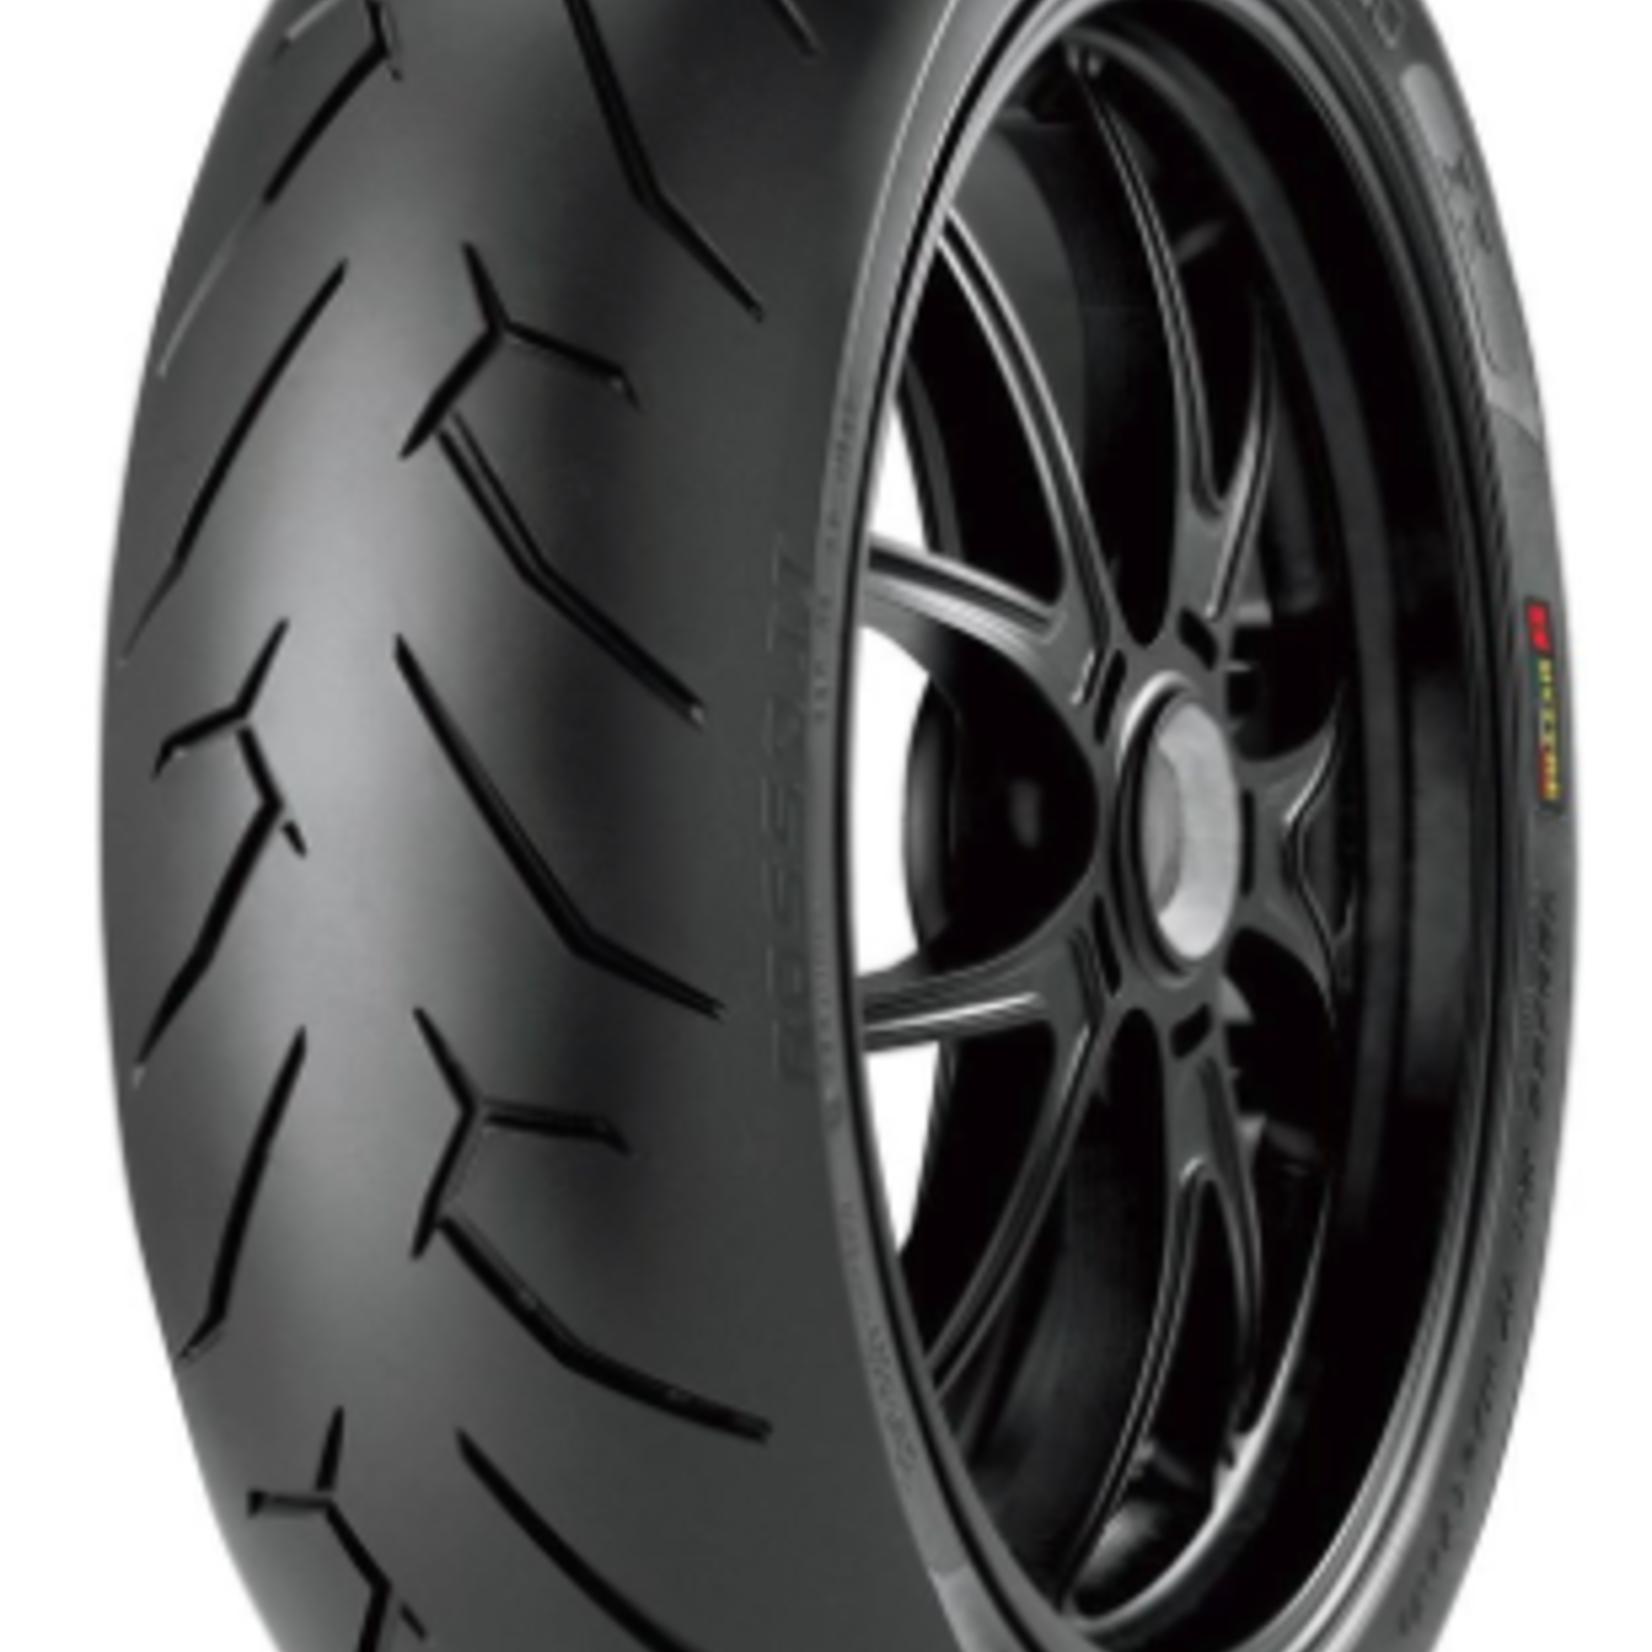 Pirelli Pirelli Street Diablo Rosso II Supersport Rear Tire - 190/55-17